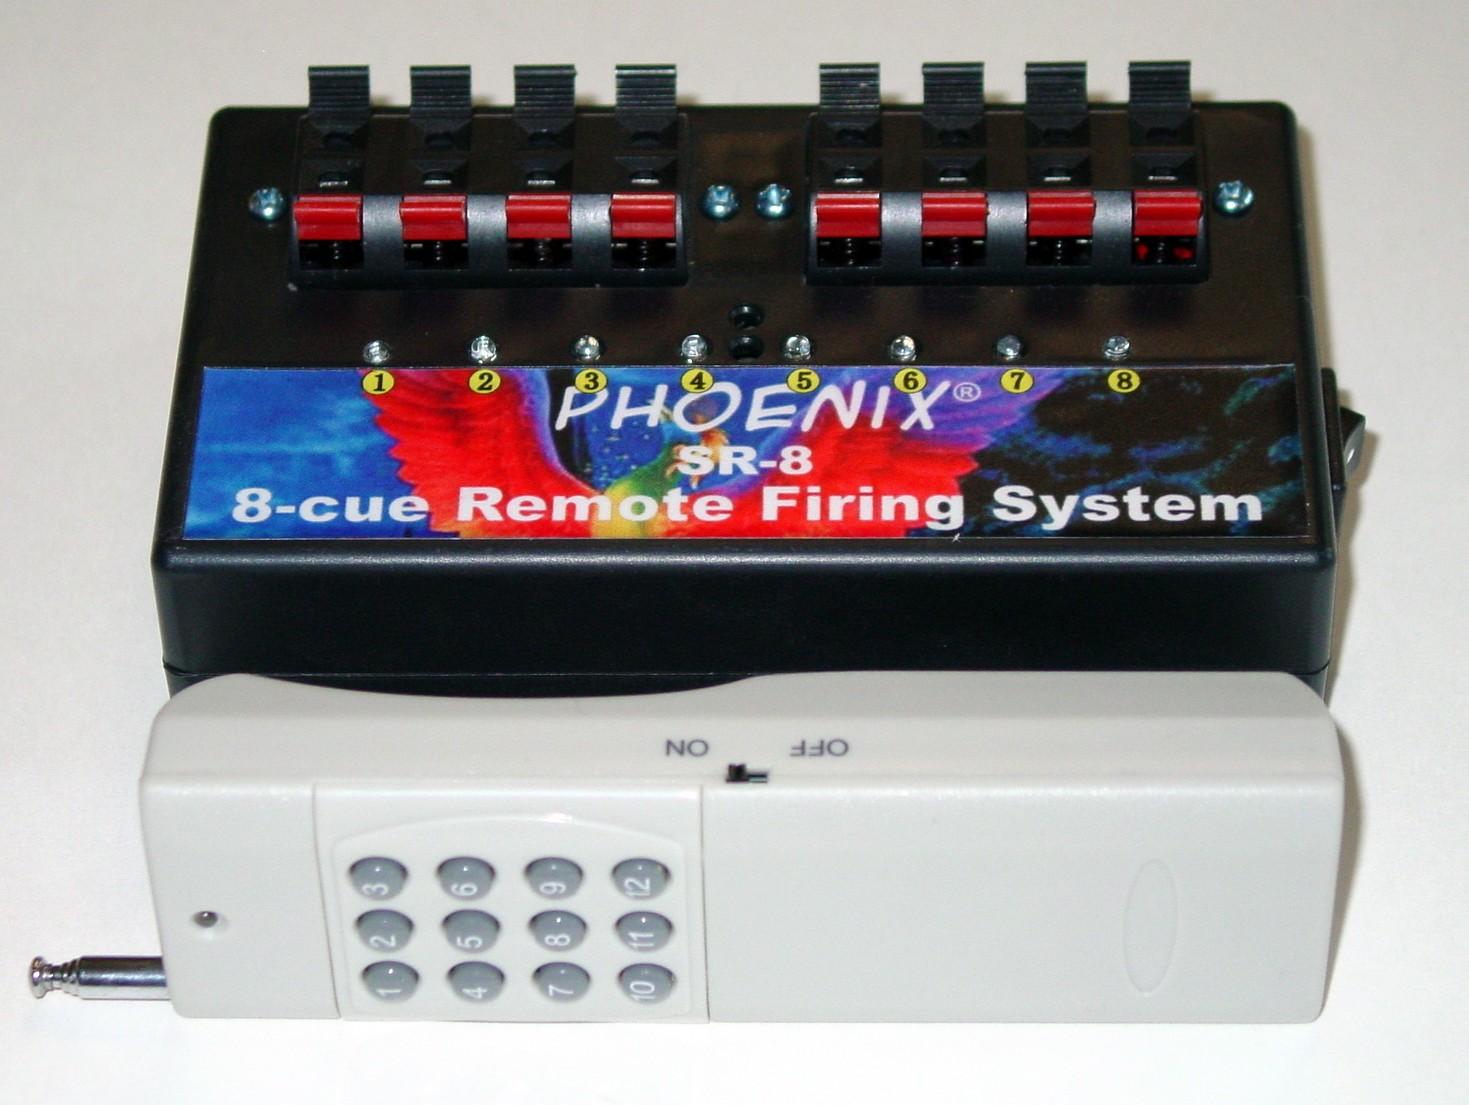 Phoenix SR-8 Single Receiver Firing System - FCC CERTIFIED